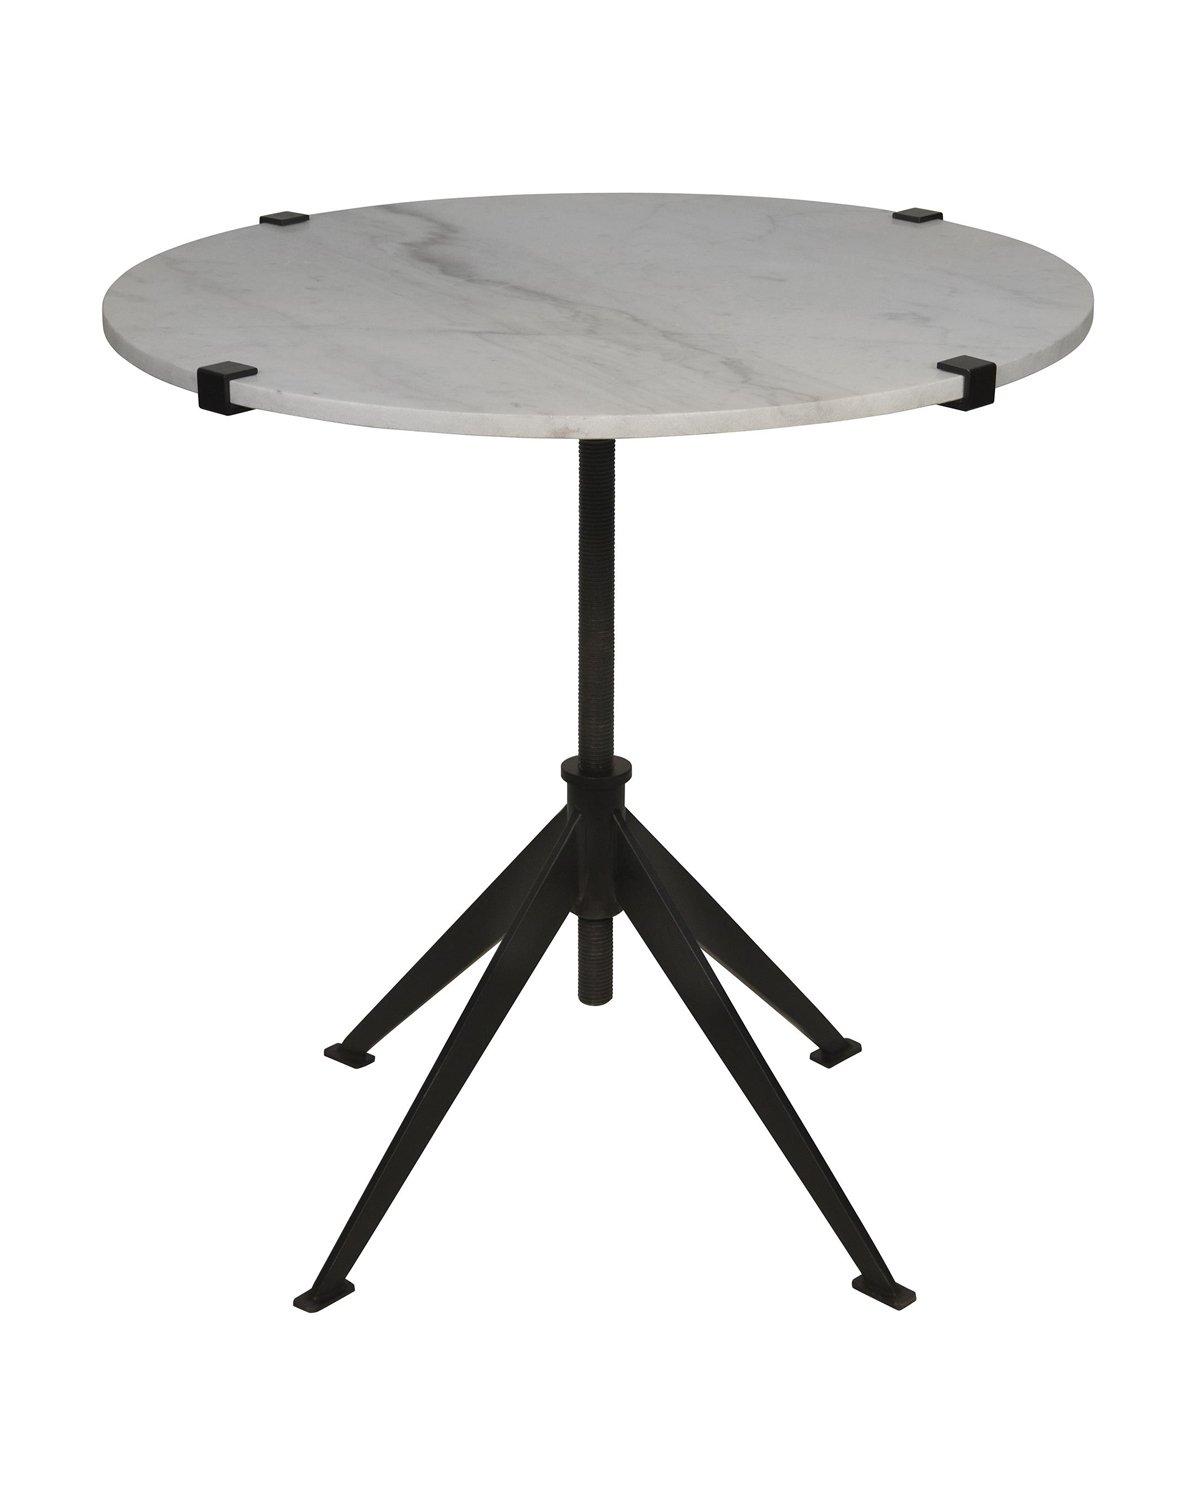 Devyn_Adjustable_Side_Table_1_056bea09-88b7-4d0a-a972-34f00bbaa2a1.jpg